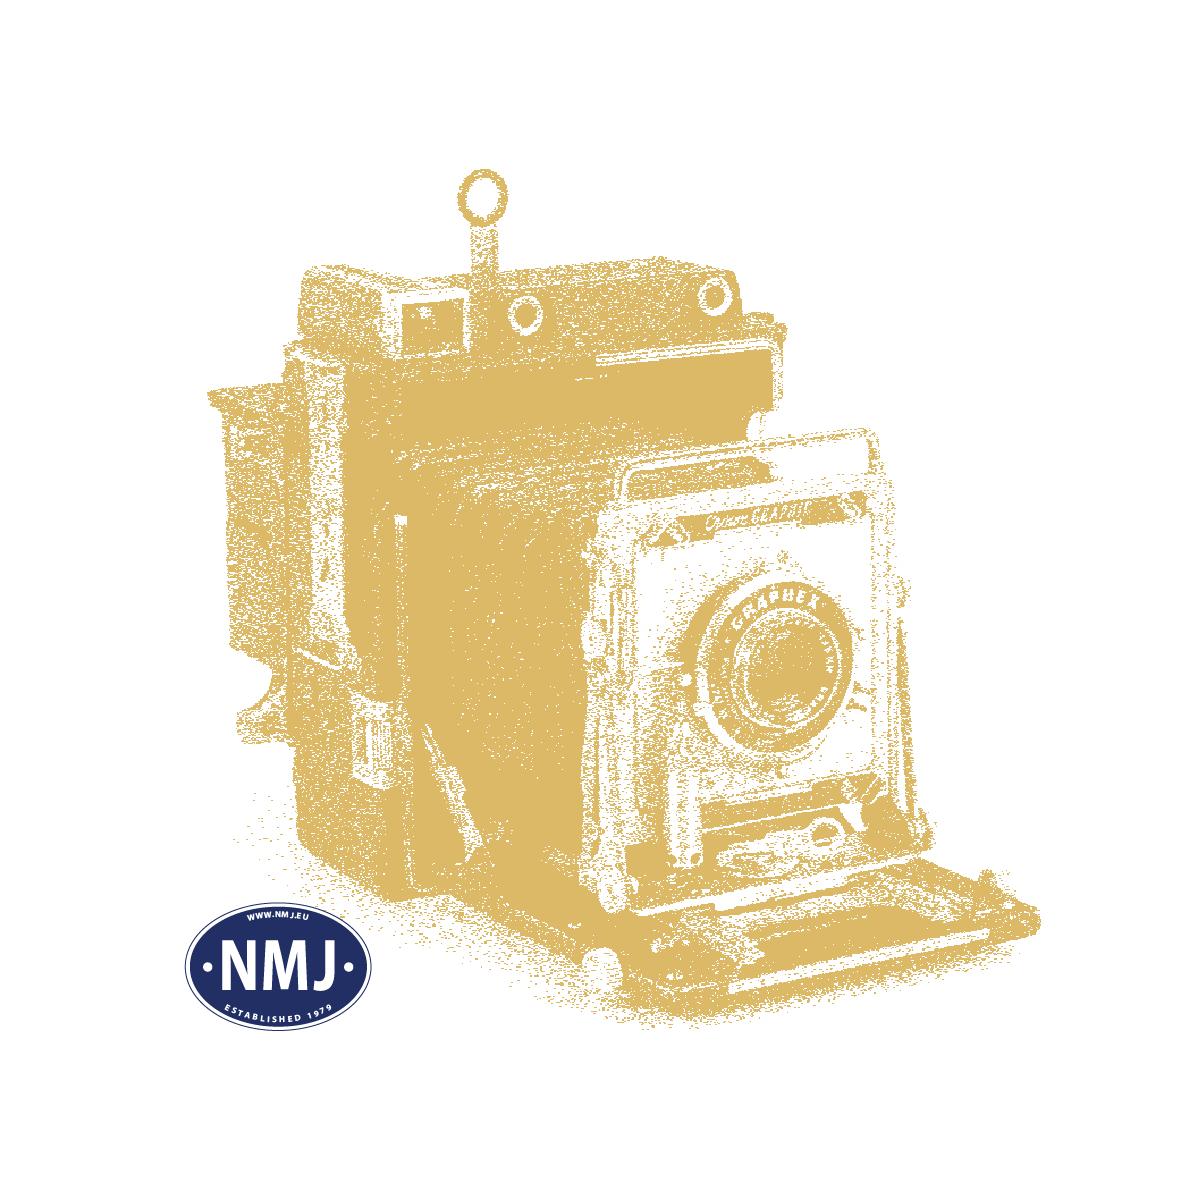 NMJT245401 - NMJ Topline SNCB 204003, 0-Skala, DCC m/ Lyd